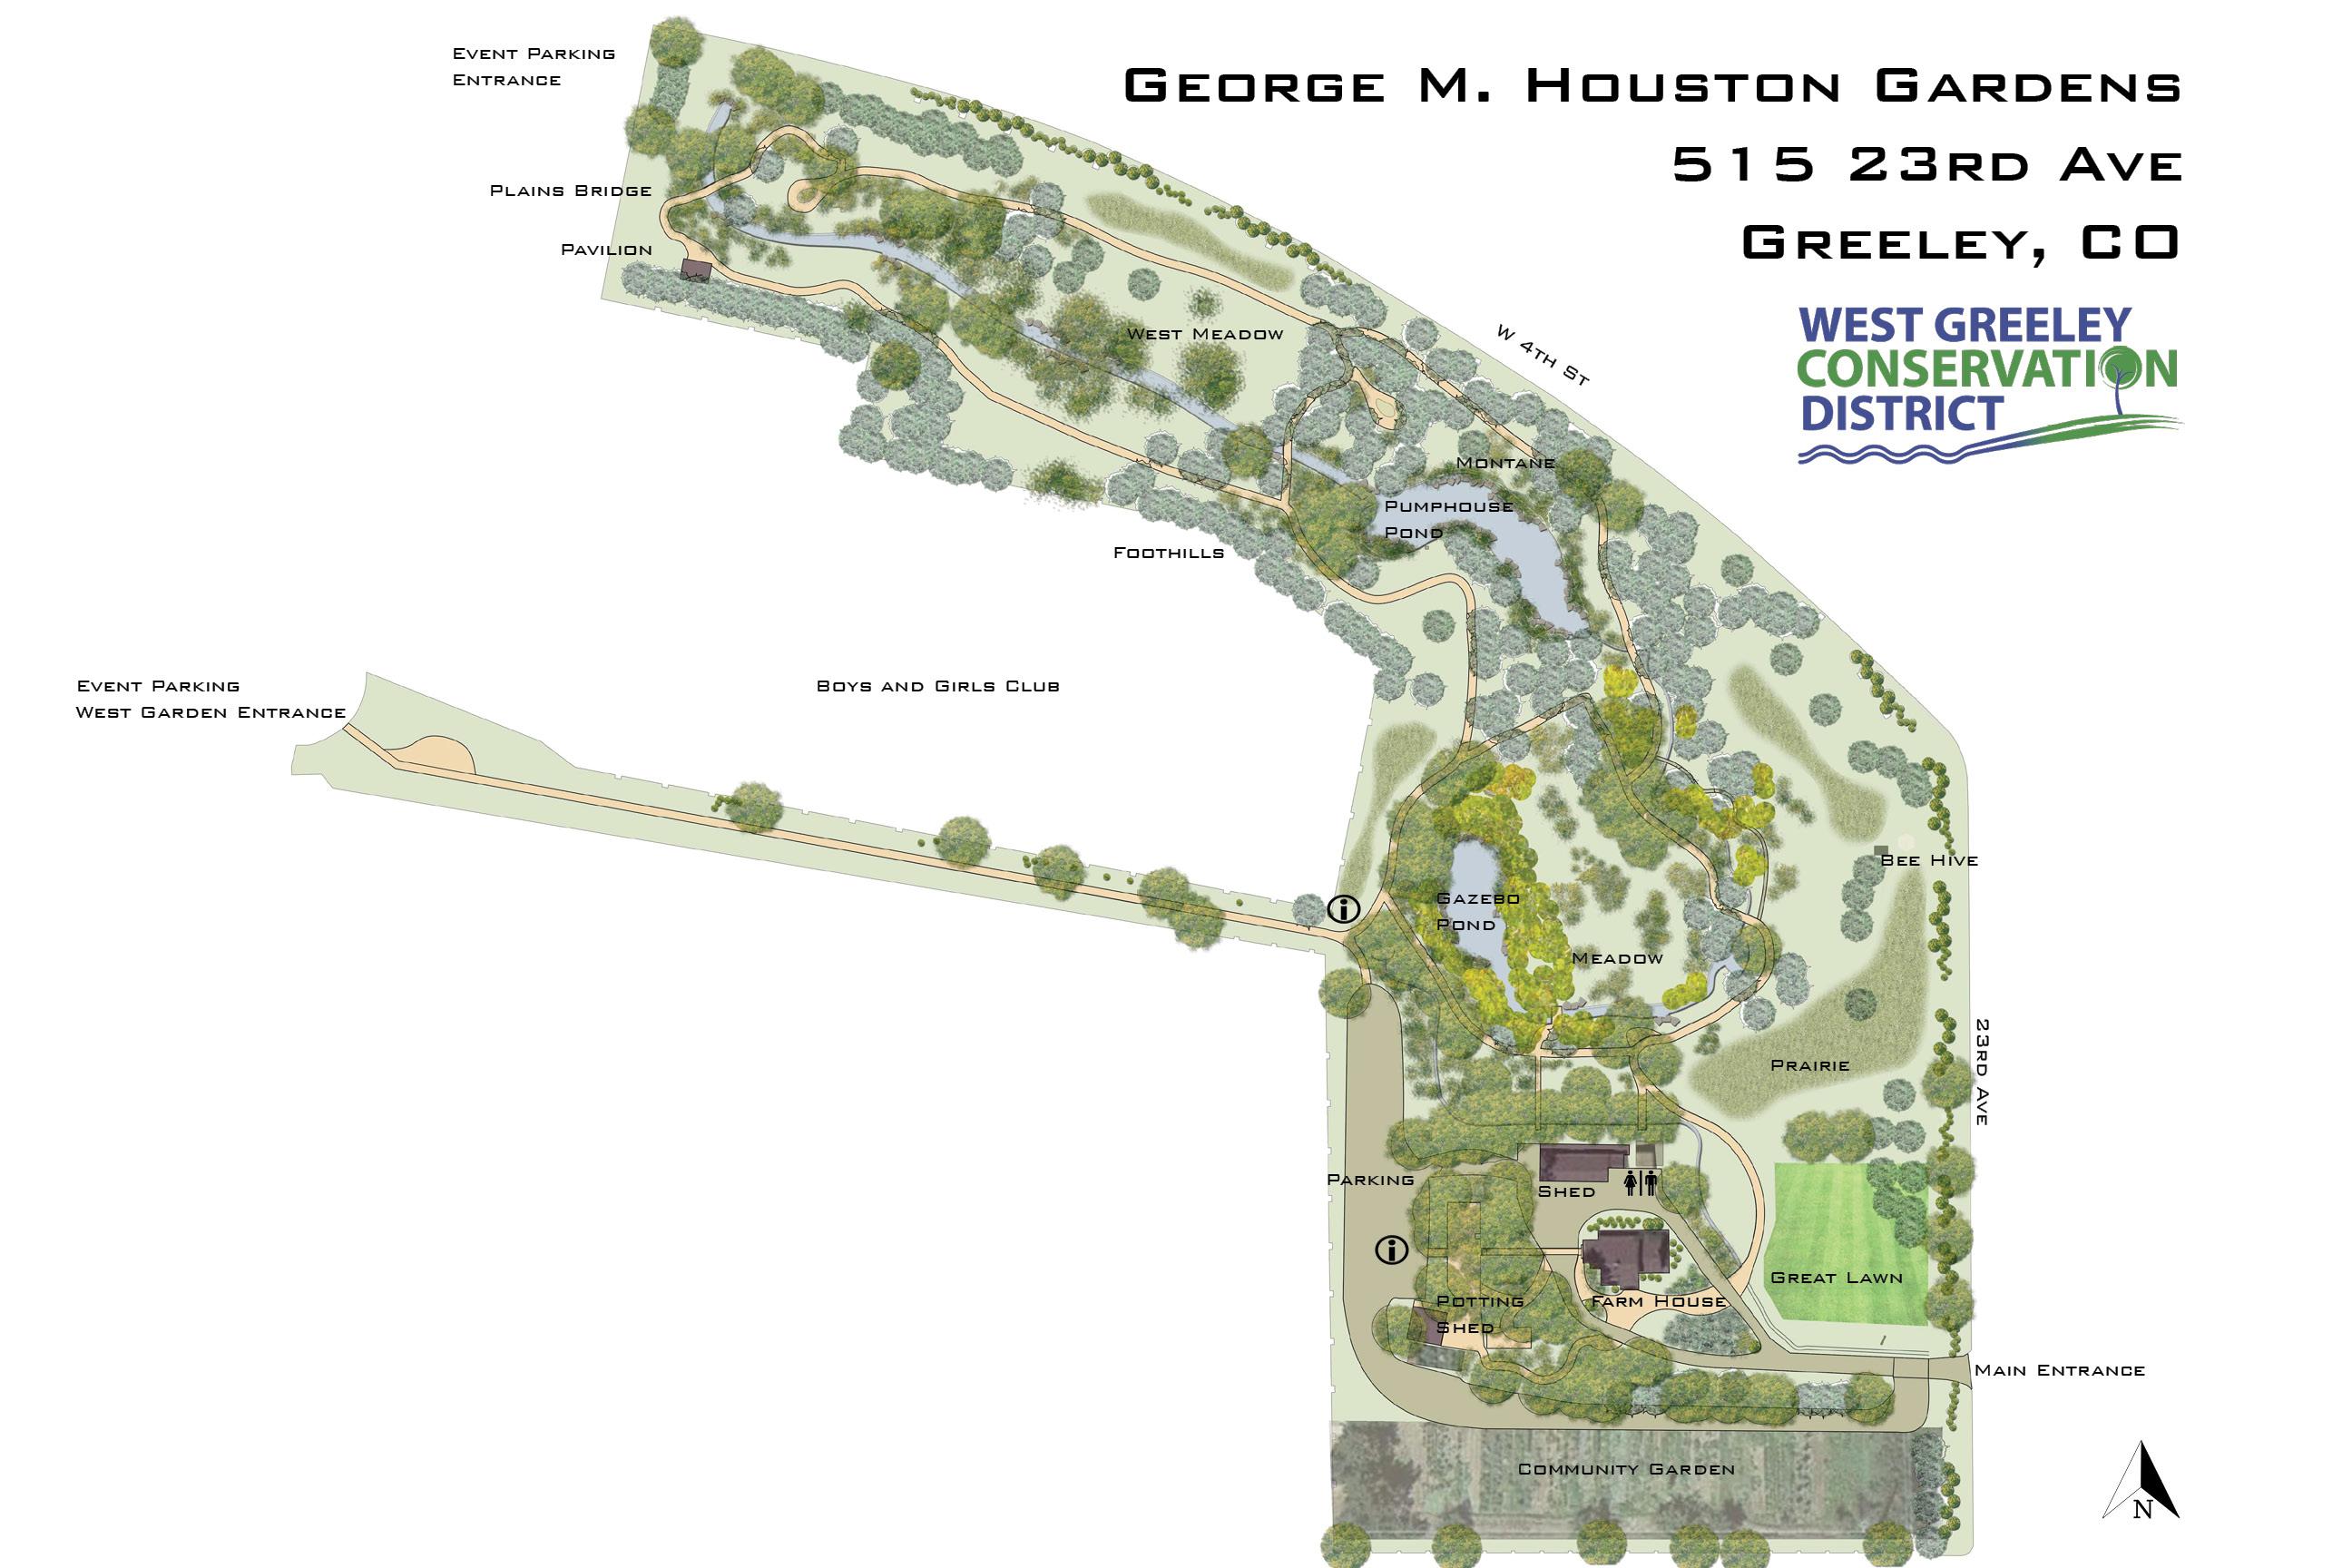 Houston Gardens, Greeleyu0027s Best Kept Secret